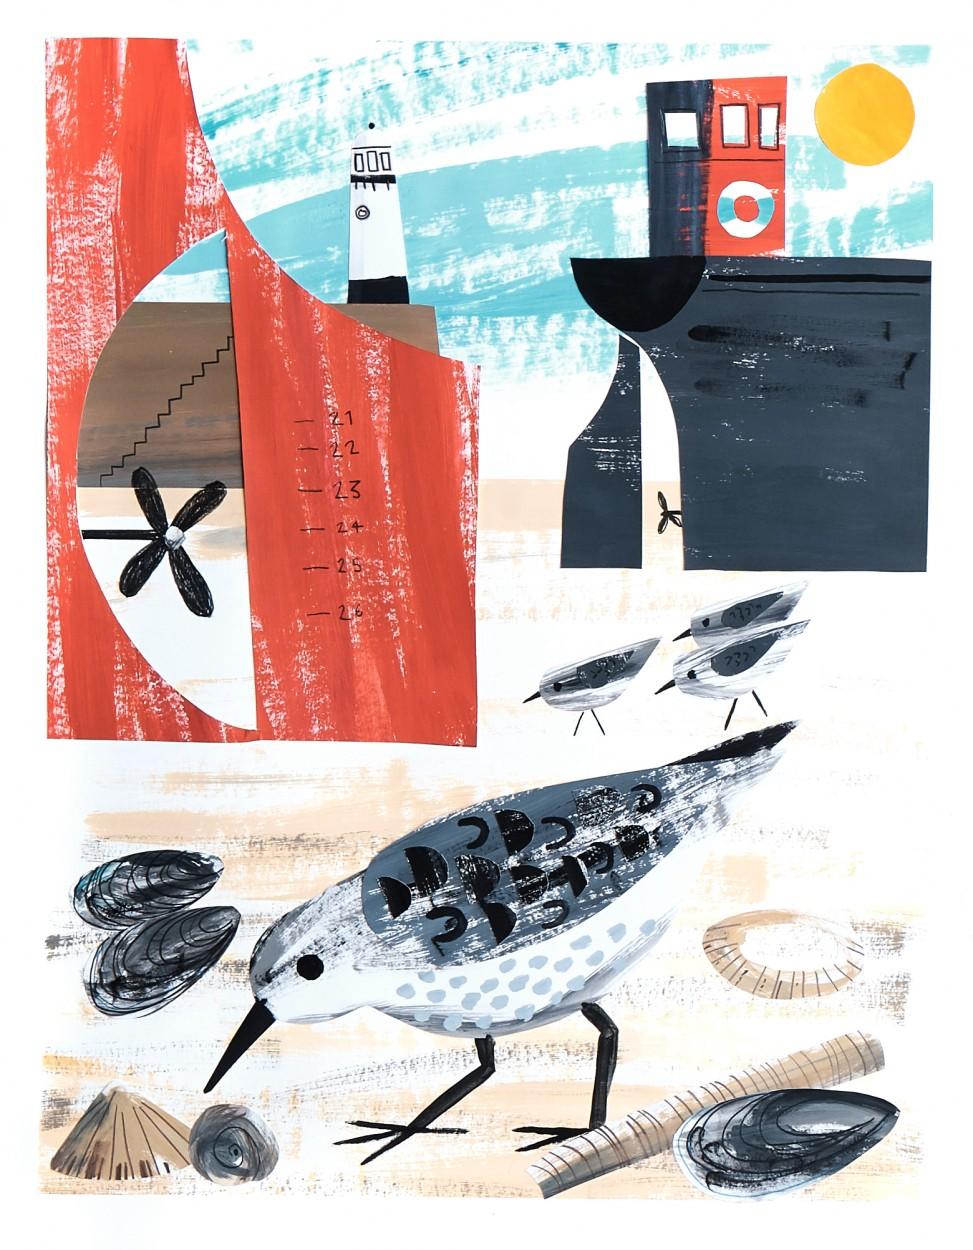 St Ives Sanderlings paper cut illustration by Matt Johnson for Seasalt Cornwall